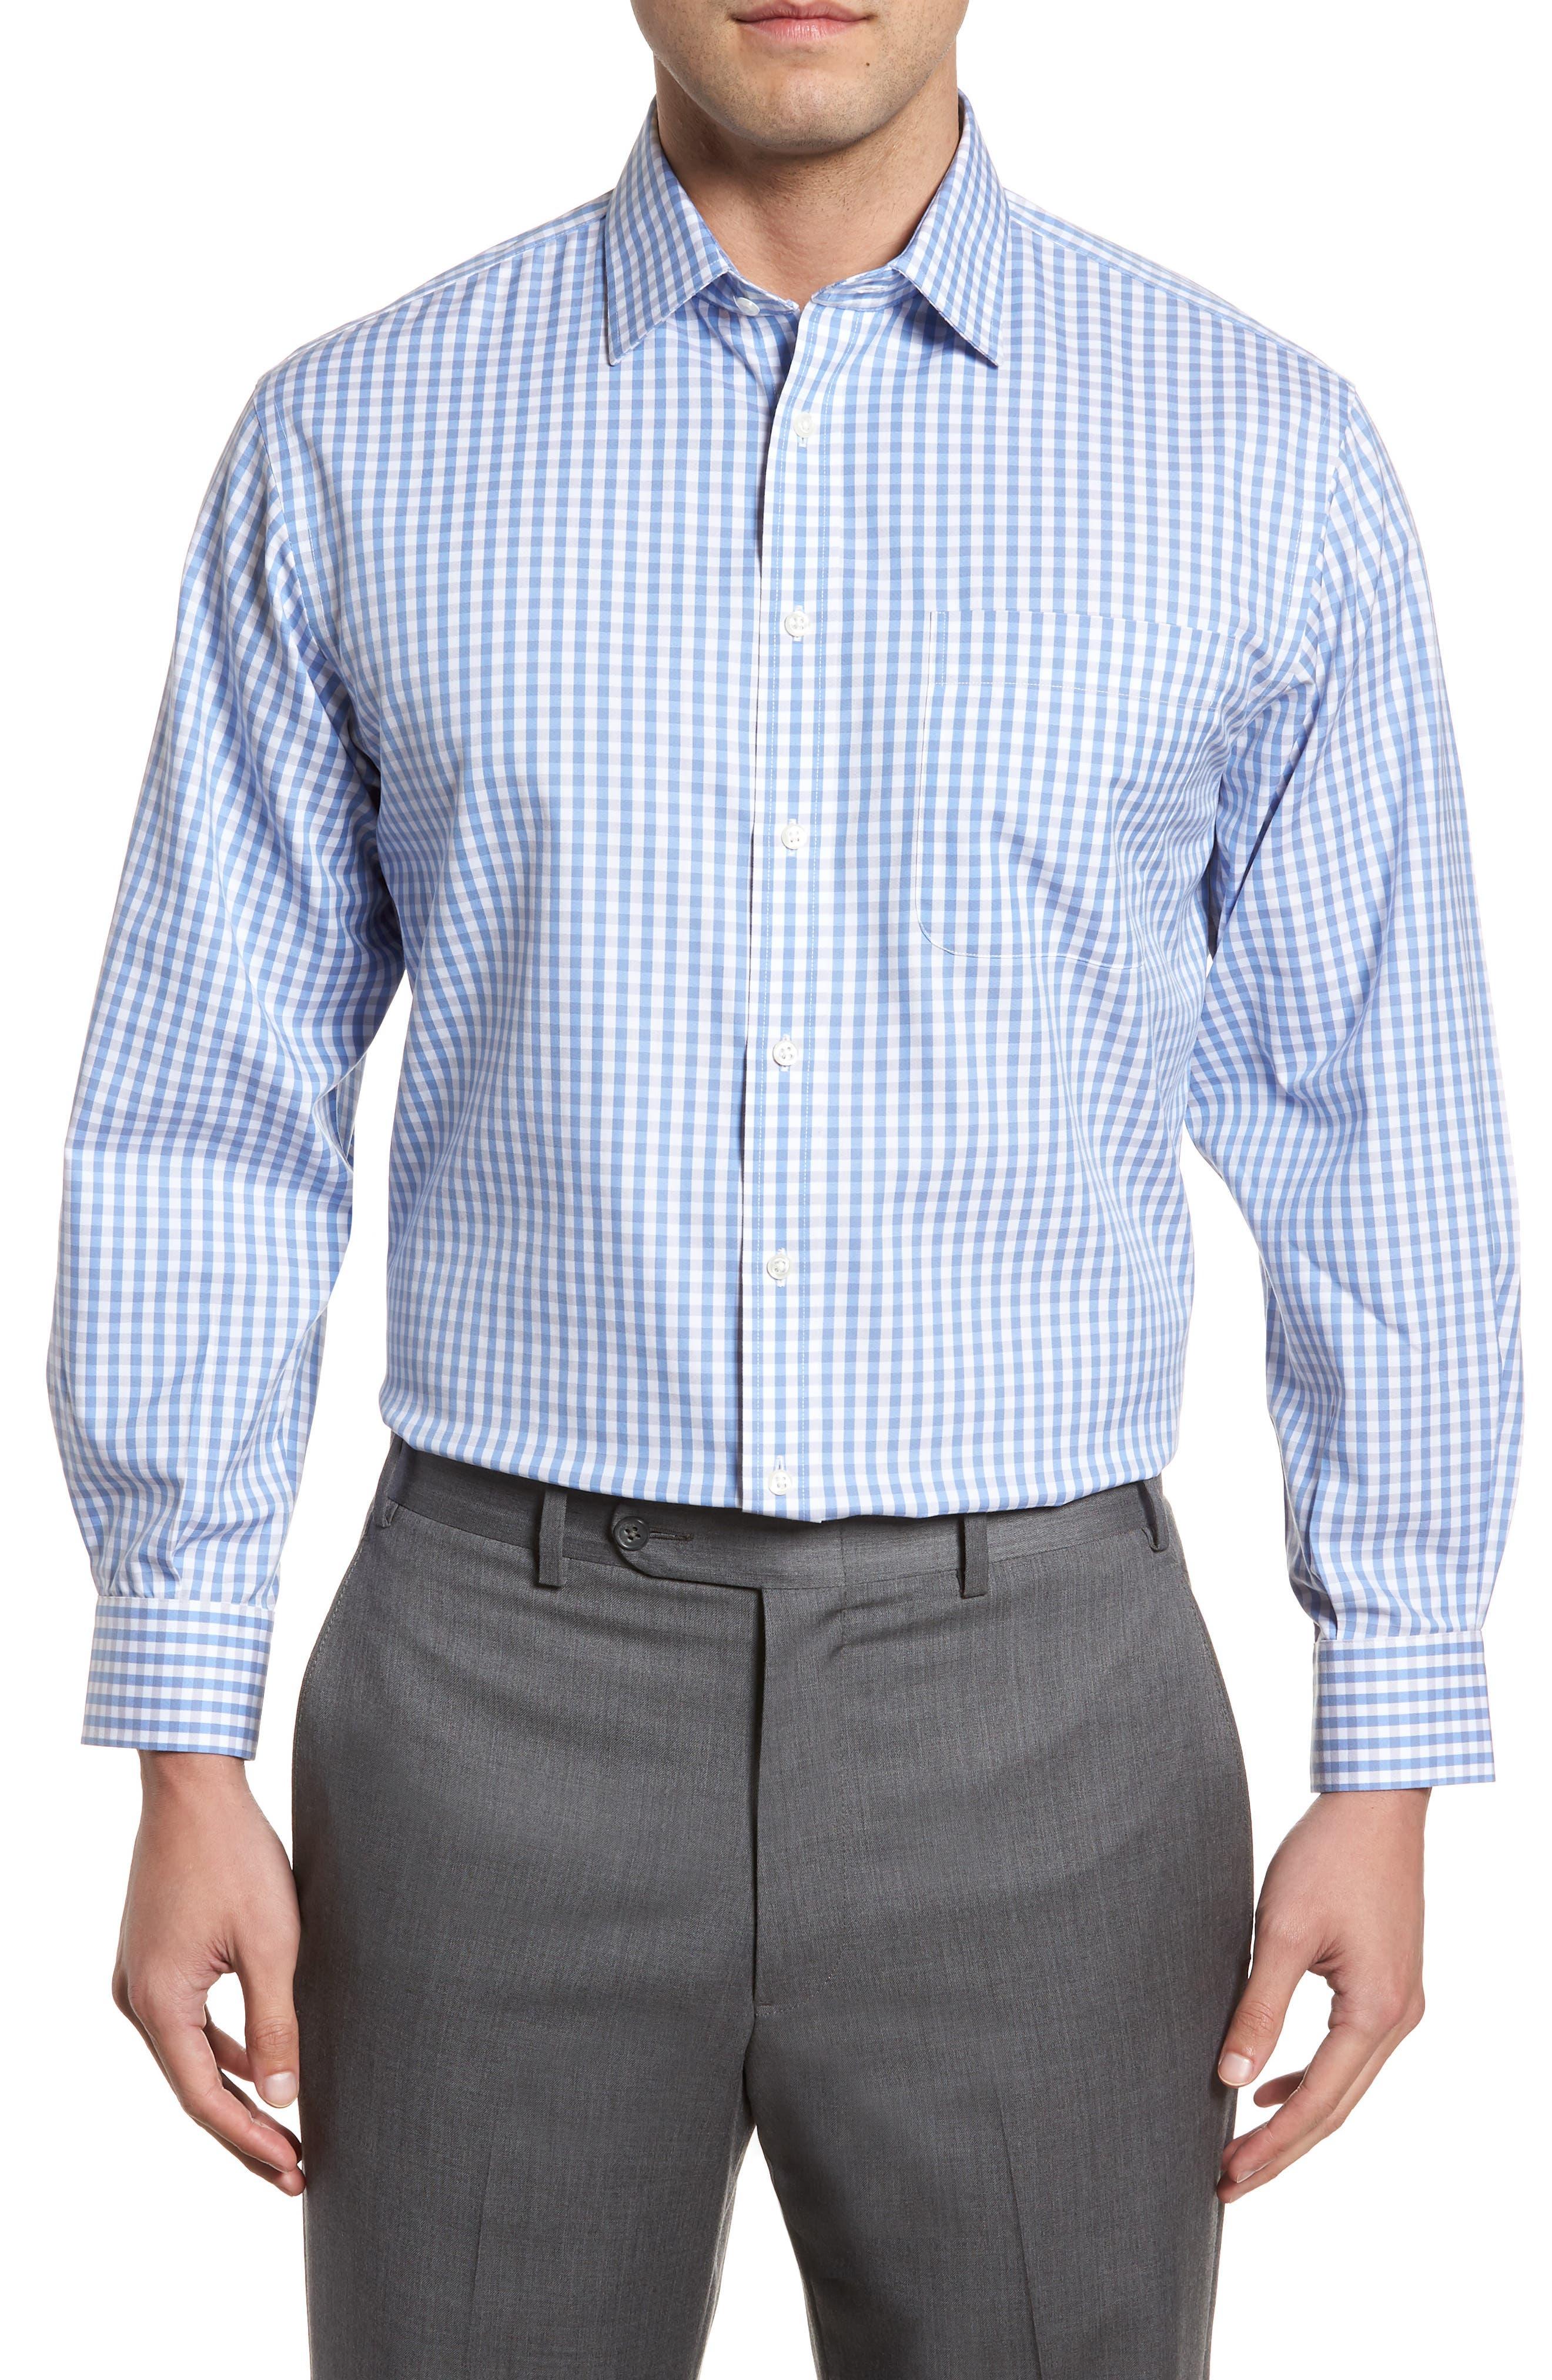 Smartcare<sup>™</sup> Classic Fit Check Dress Shirt,                             Main thumbnail 1, color,                             Grey Micro